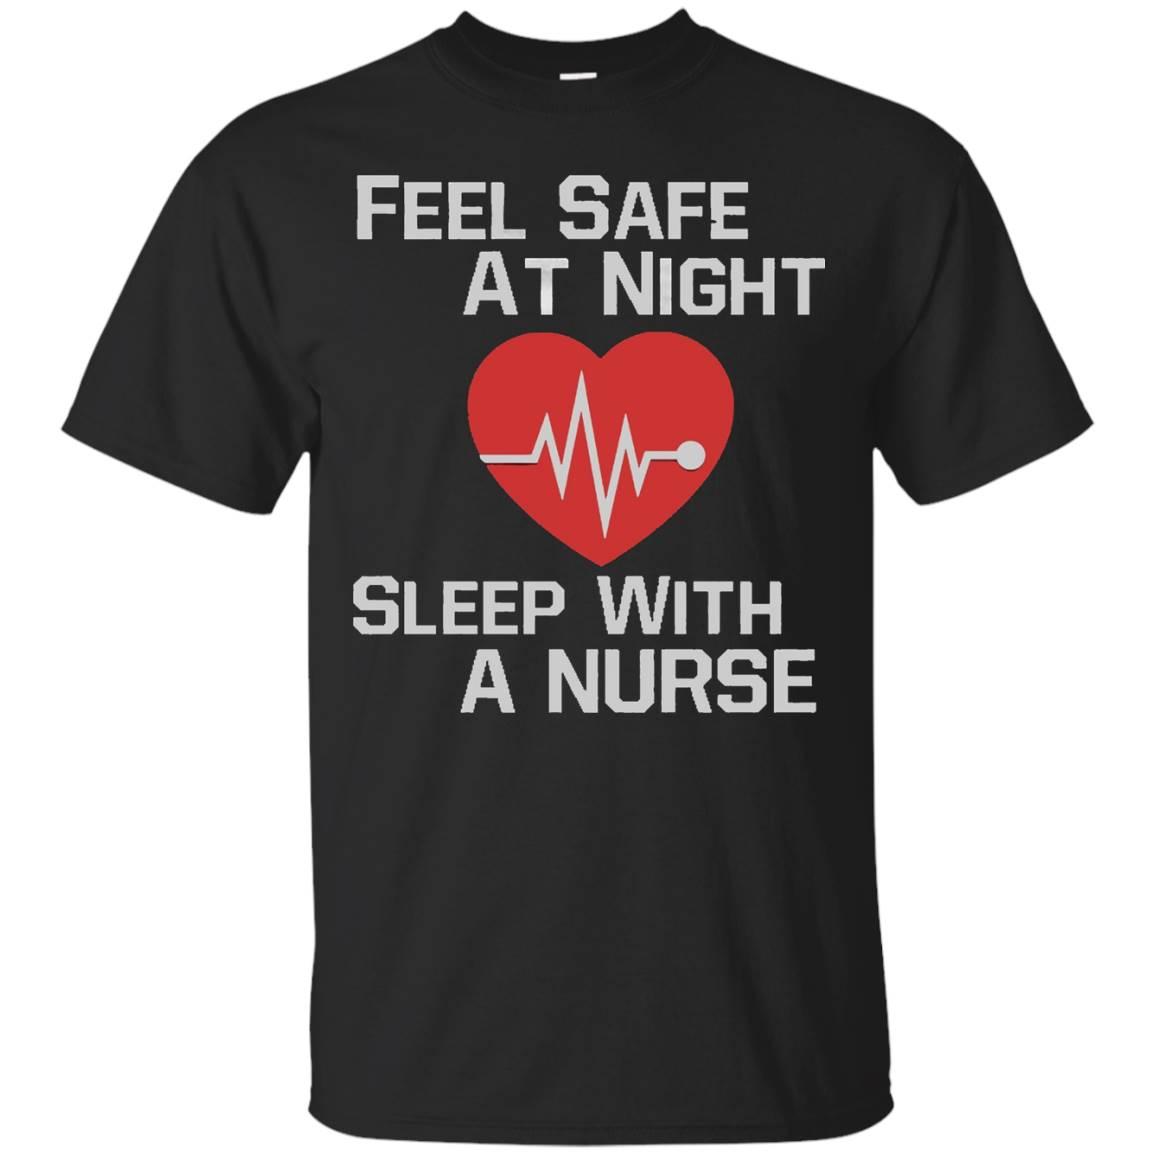 Feel Safe At Night – Sleep With a Nurse T shirt